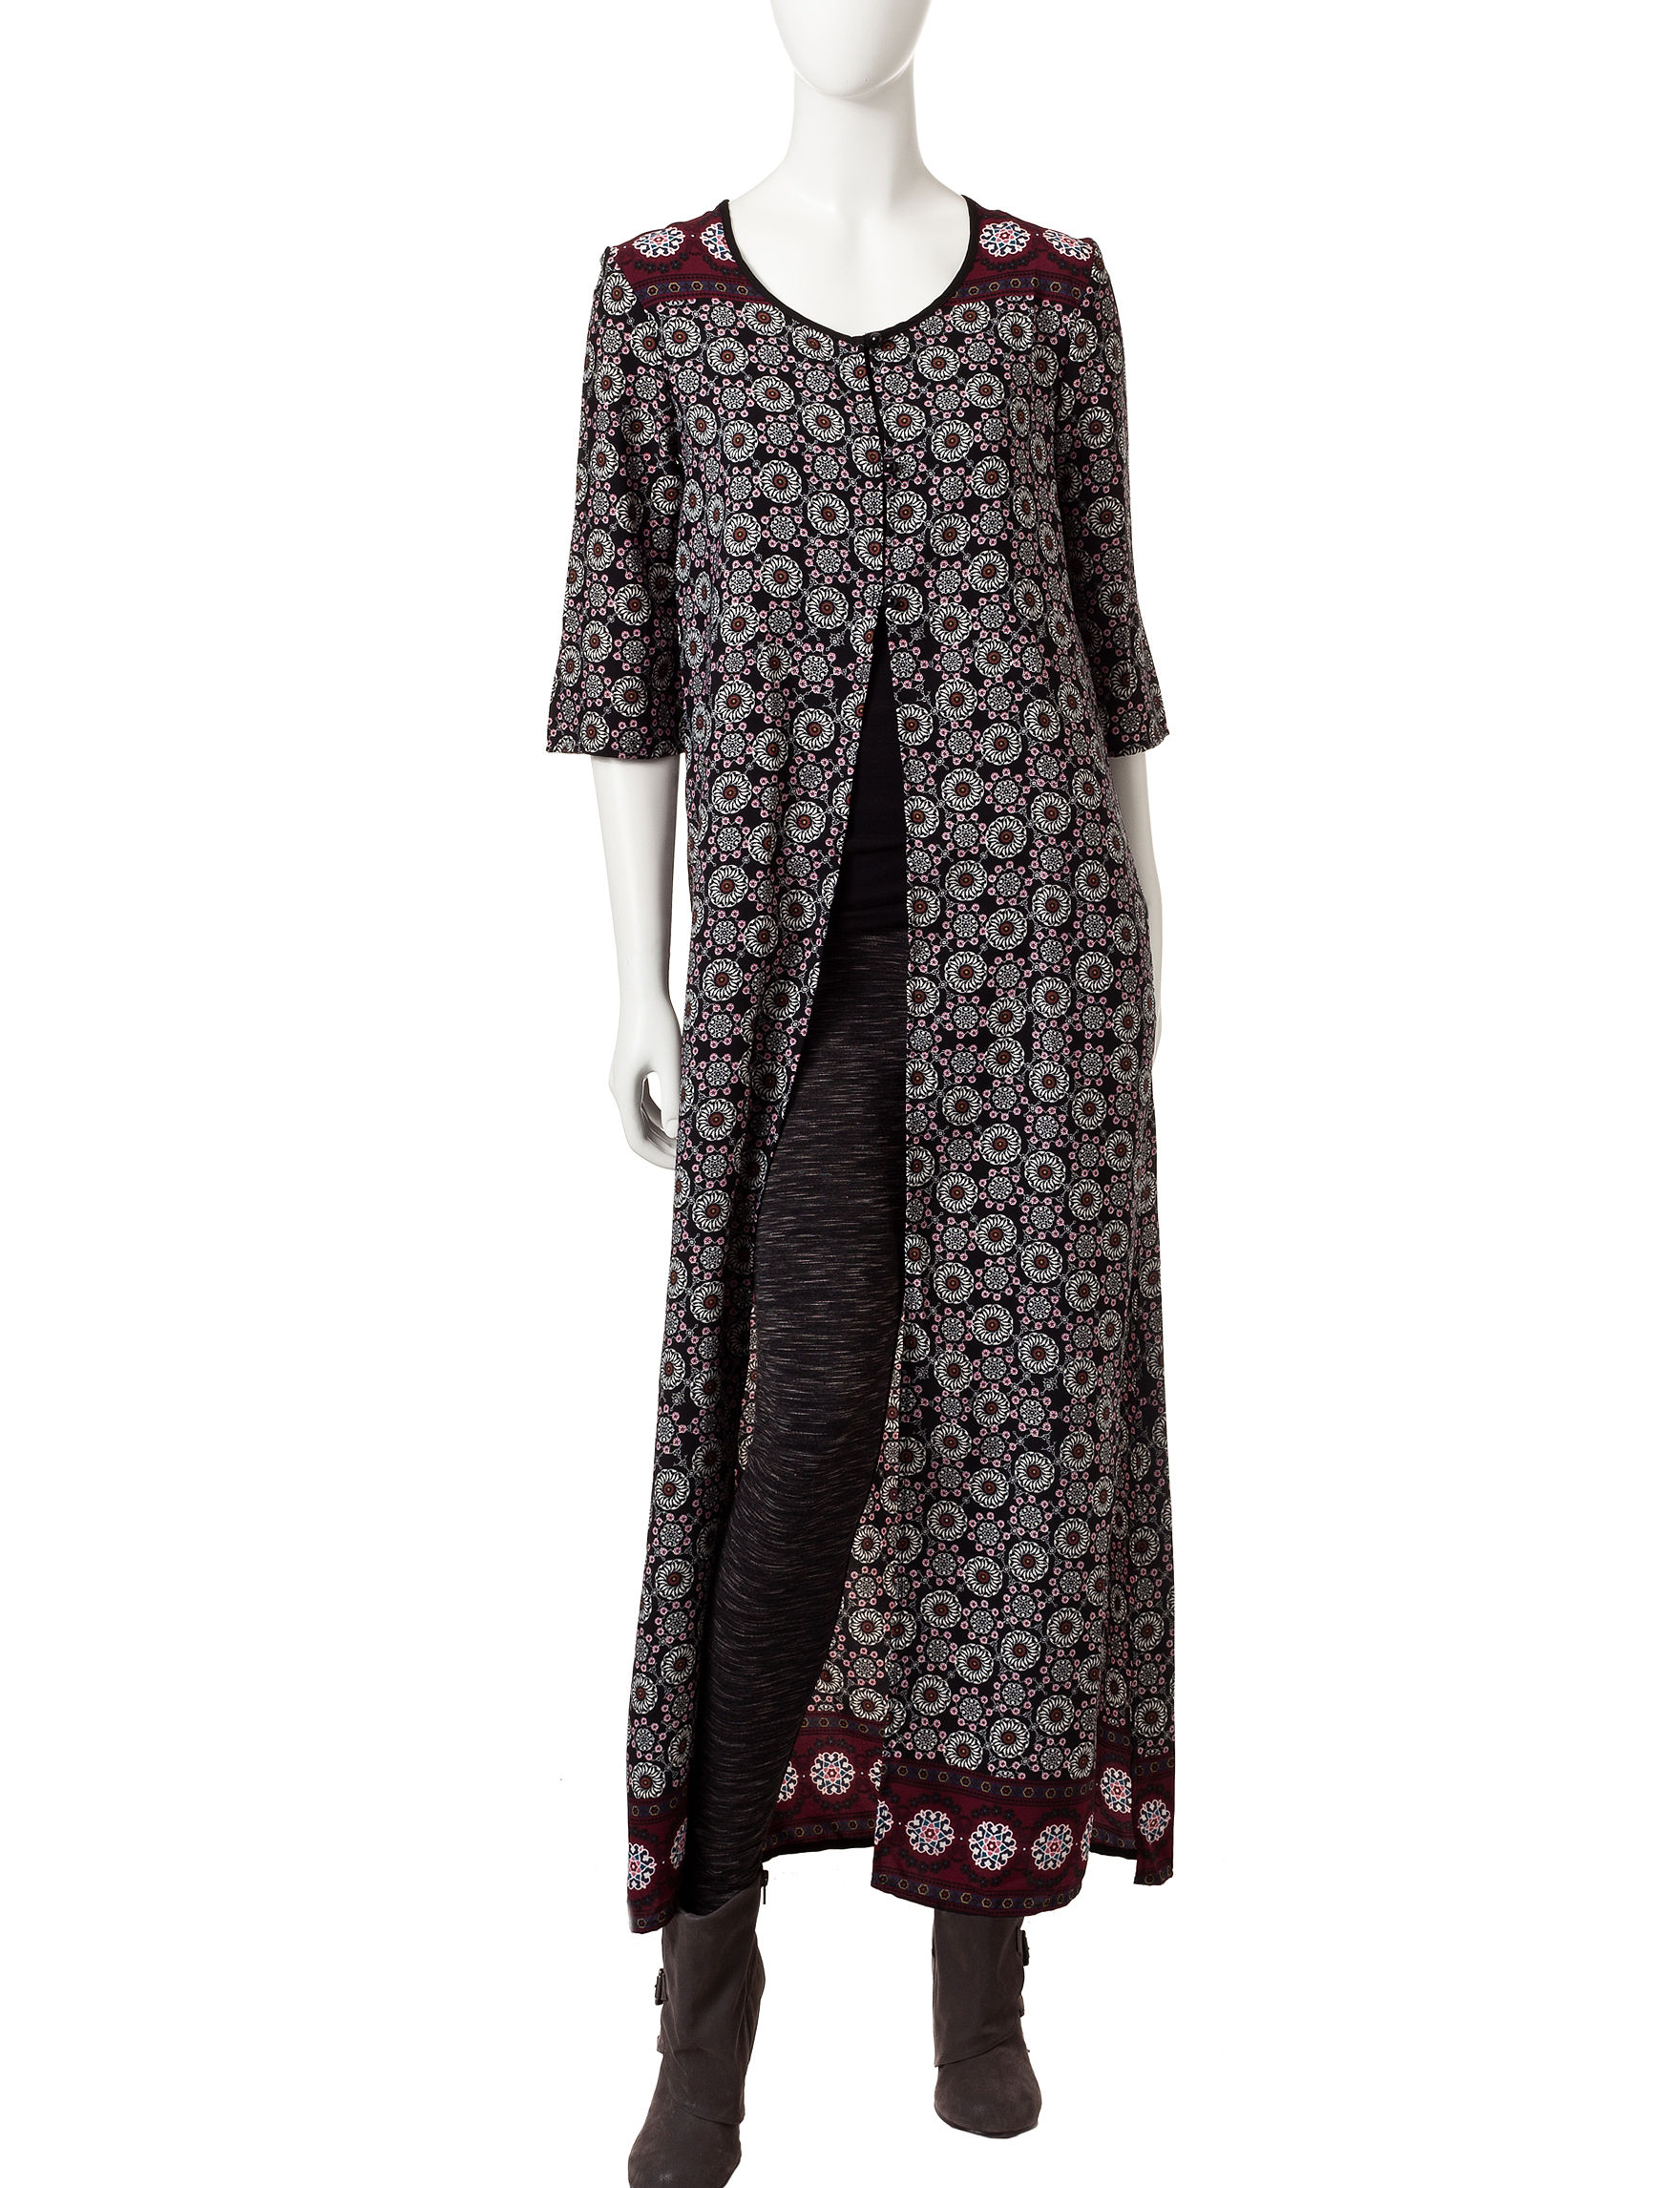 Romeo + Juliet Couture Burgundy